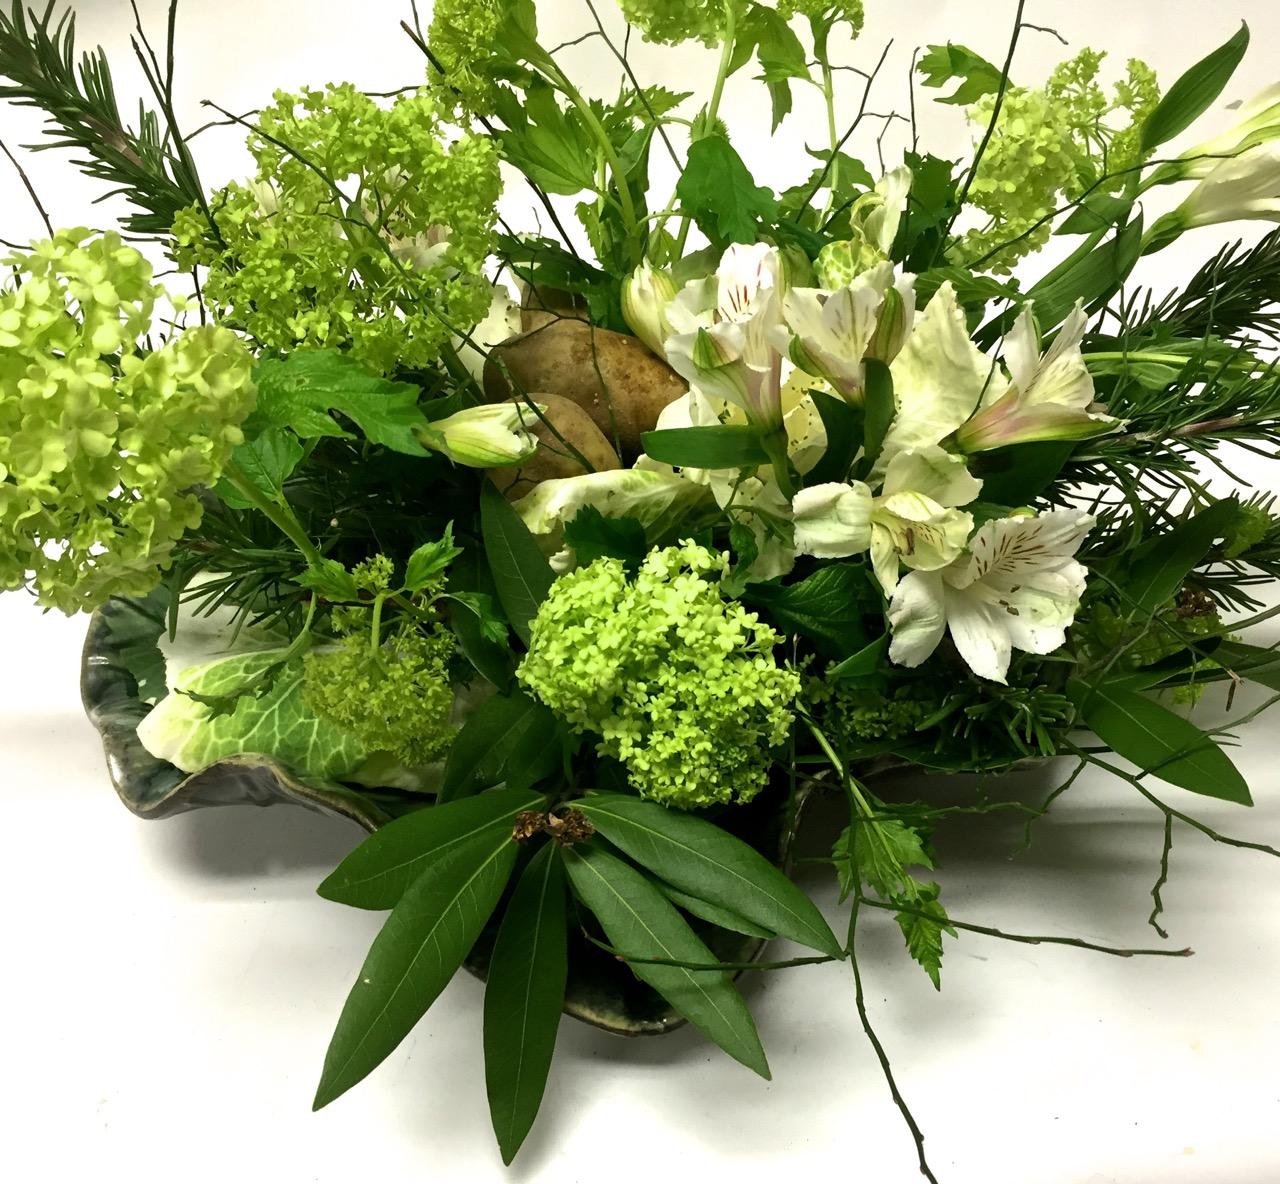 ardith_flowers_stpattys_bigger_photo5.jpg